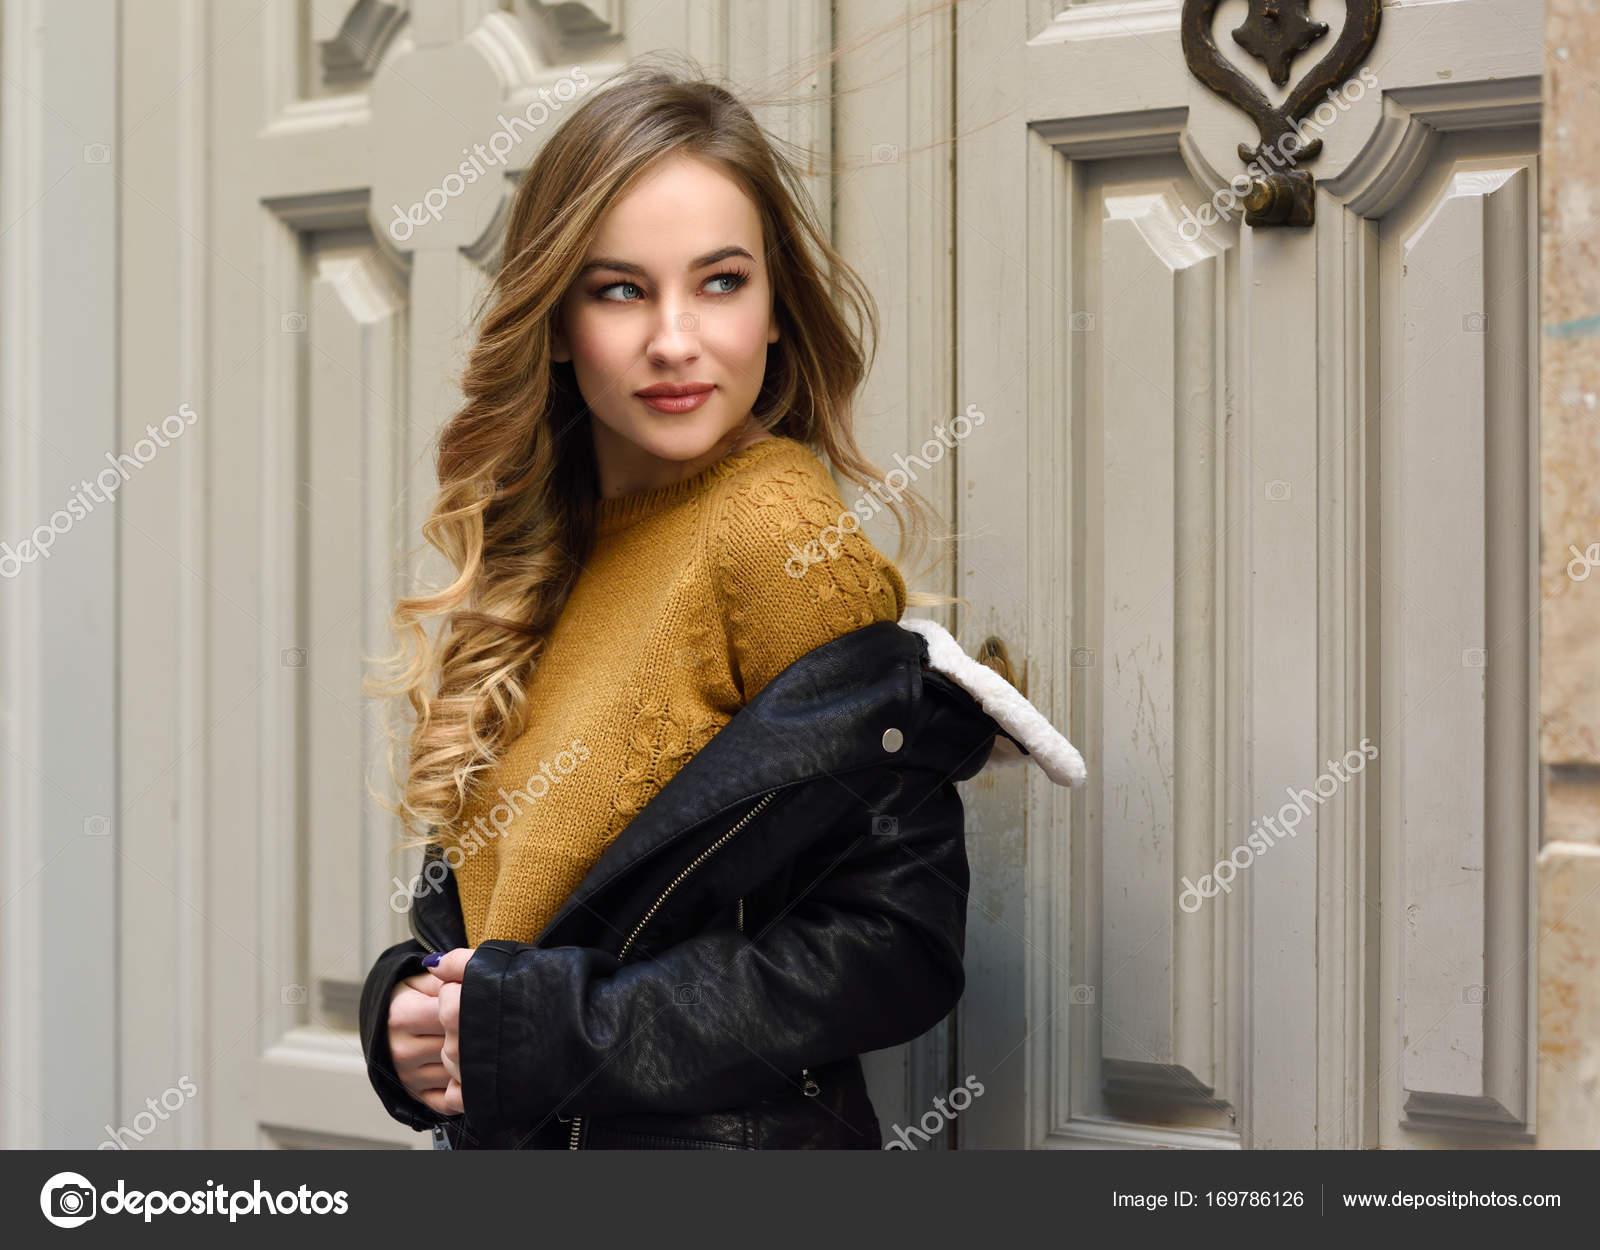 Javiindy — Russe Contexte Urbain En Blonde Belle Femme Photographie yvgYI7bf6m